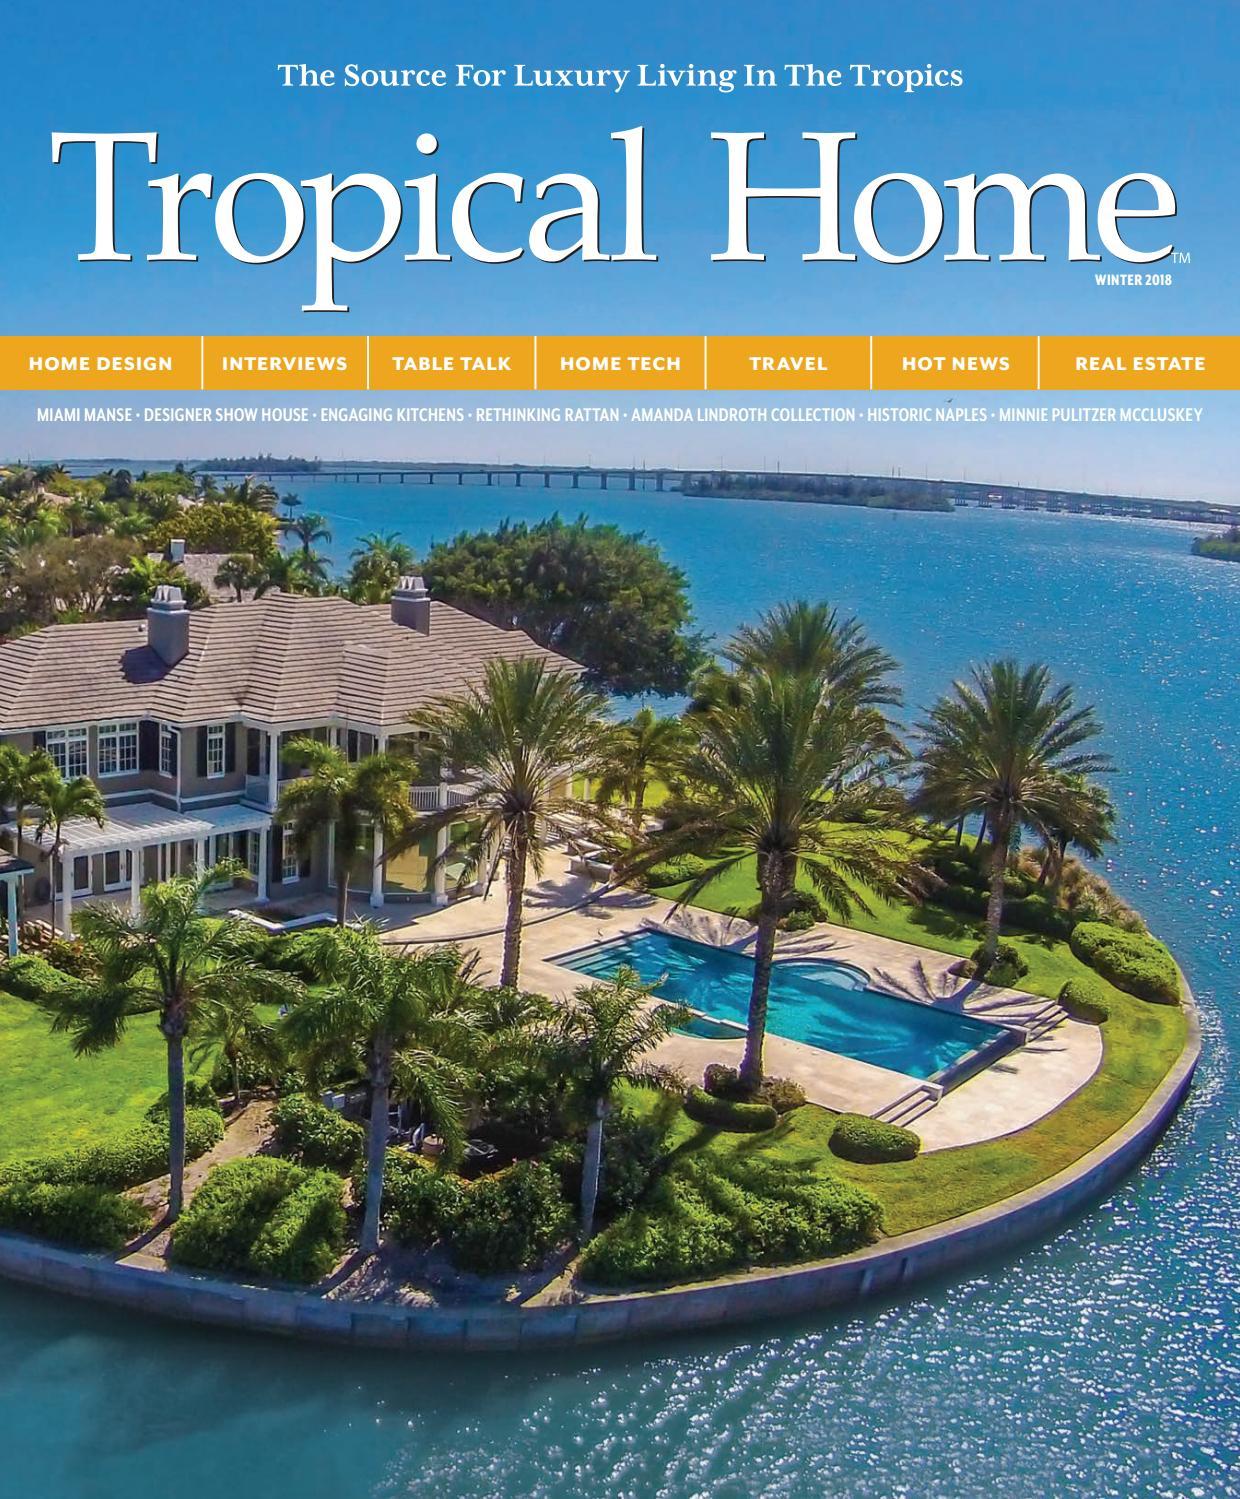 Tropical Home Winter 2018 by Vero Beach Magazine - issuu